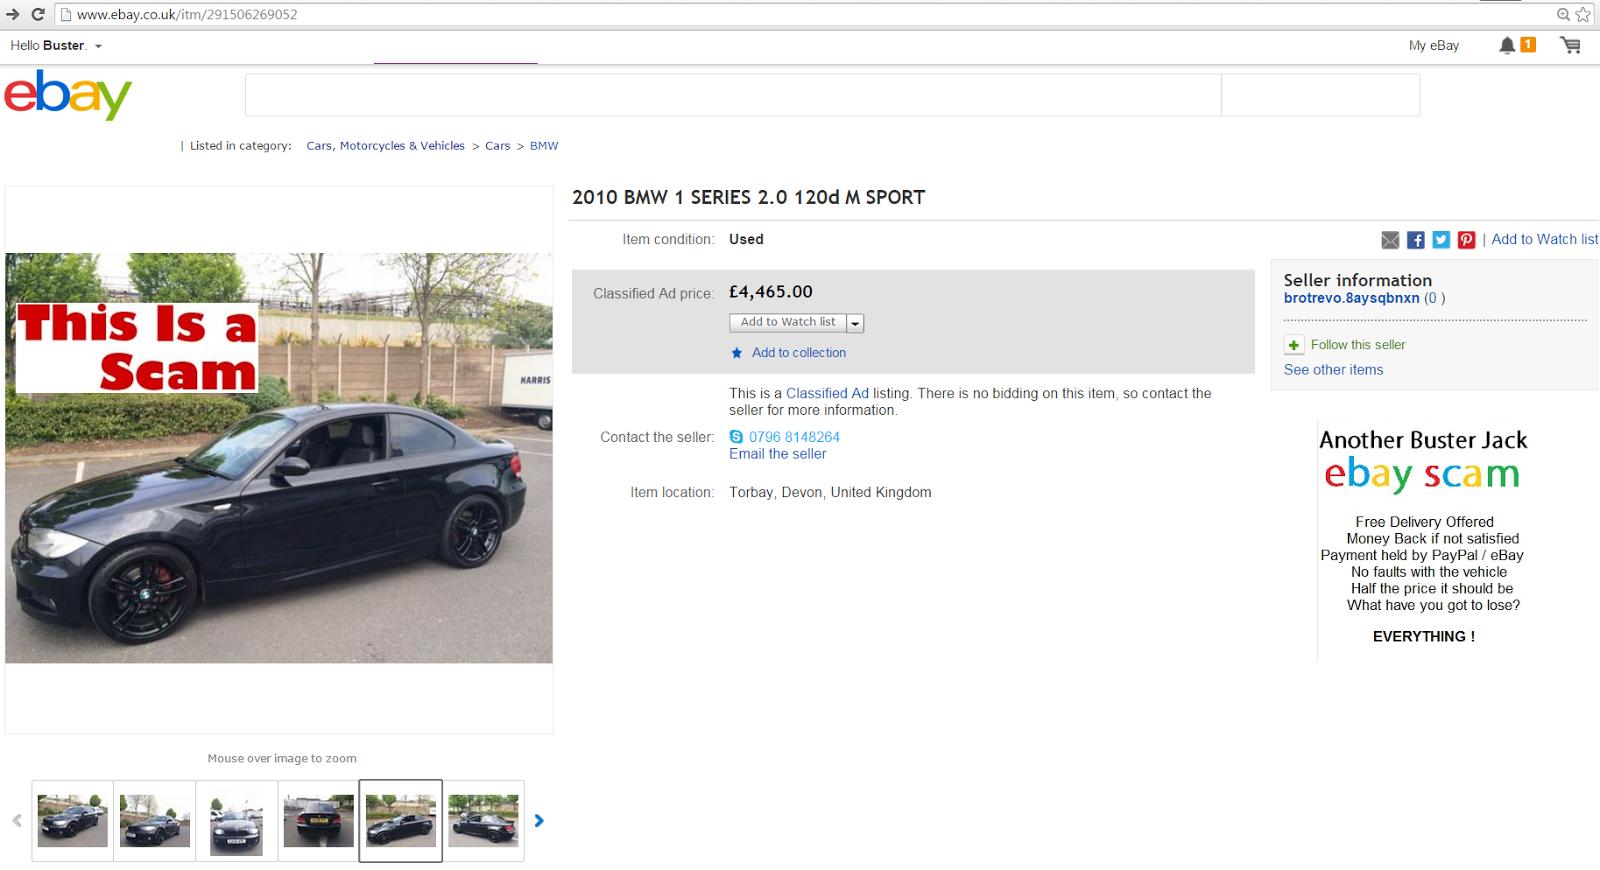 EBAY SCAM : 2010 BMW 1 SERIES 2.0 120d M SPORT | EA59XPC - FRAUD ...